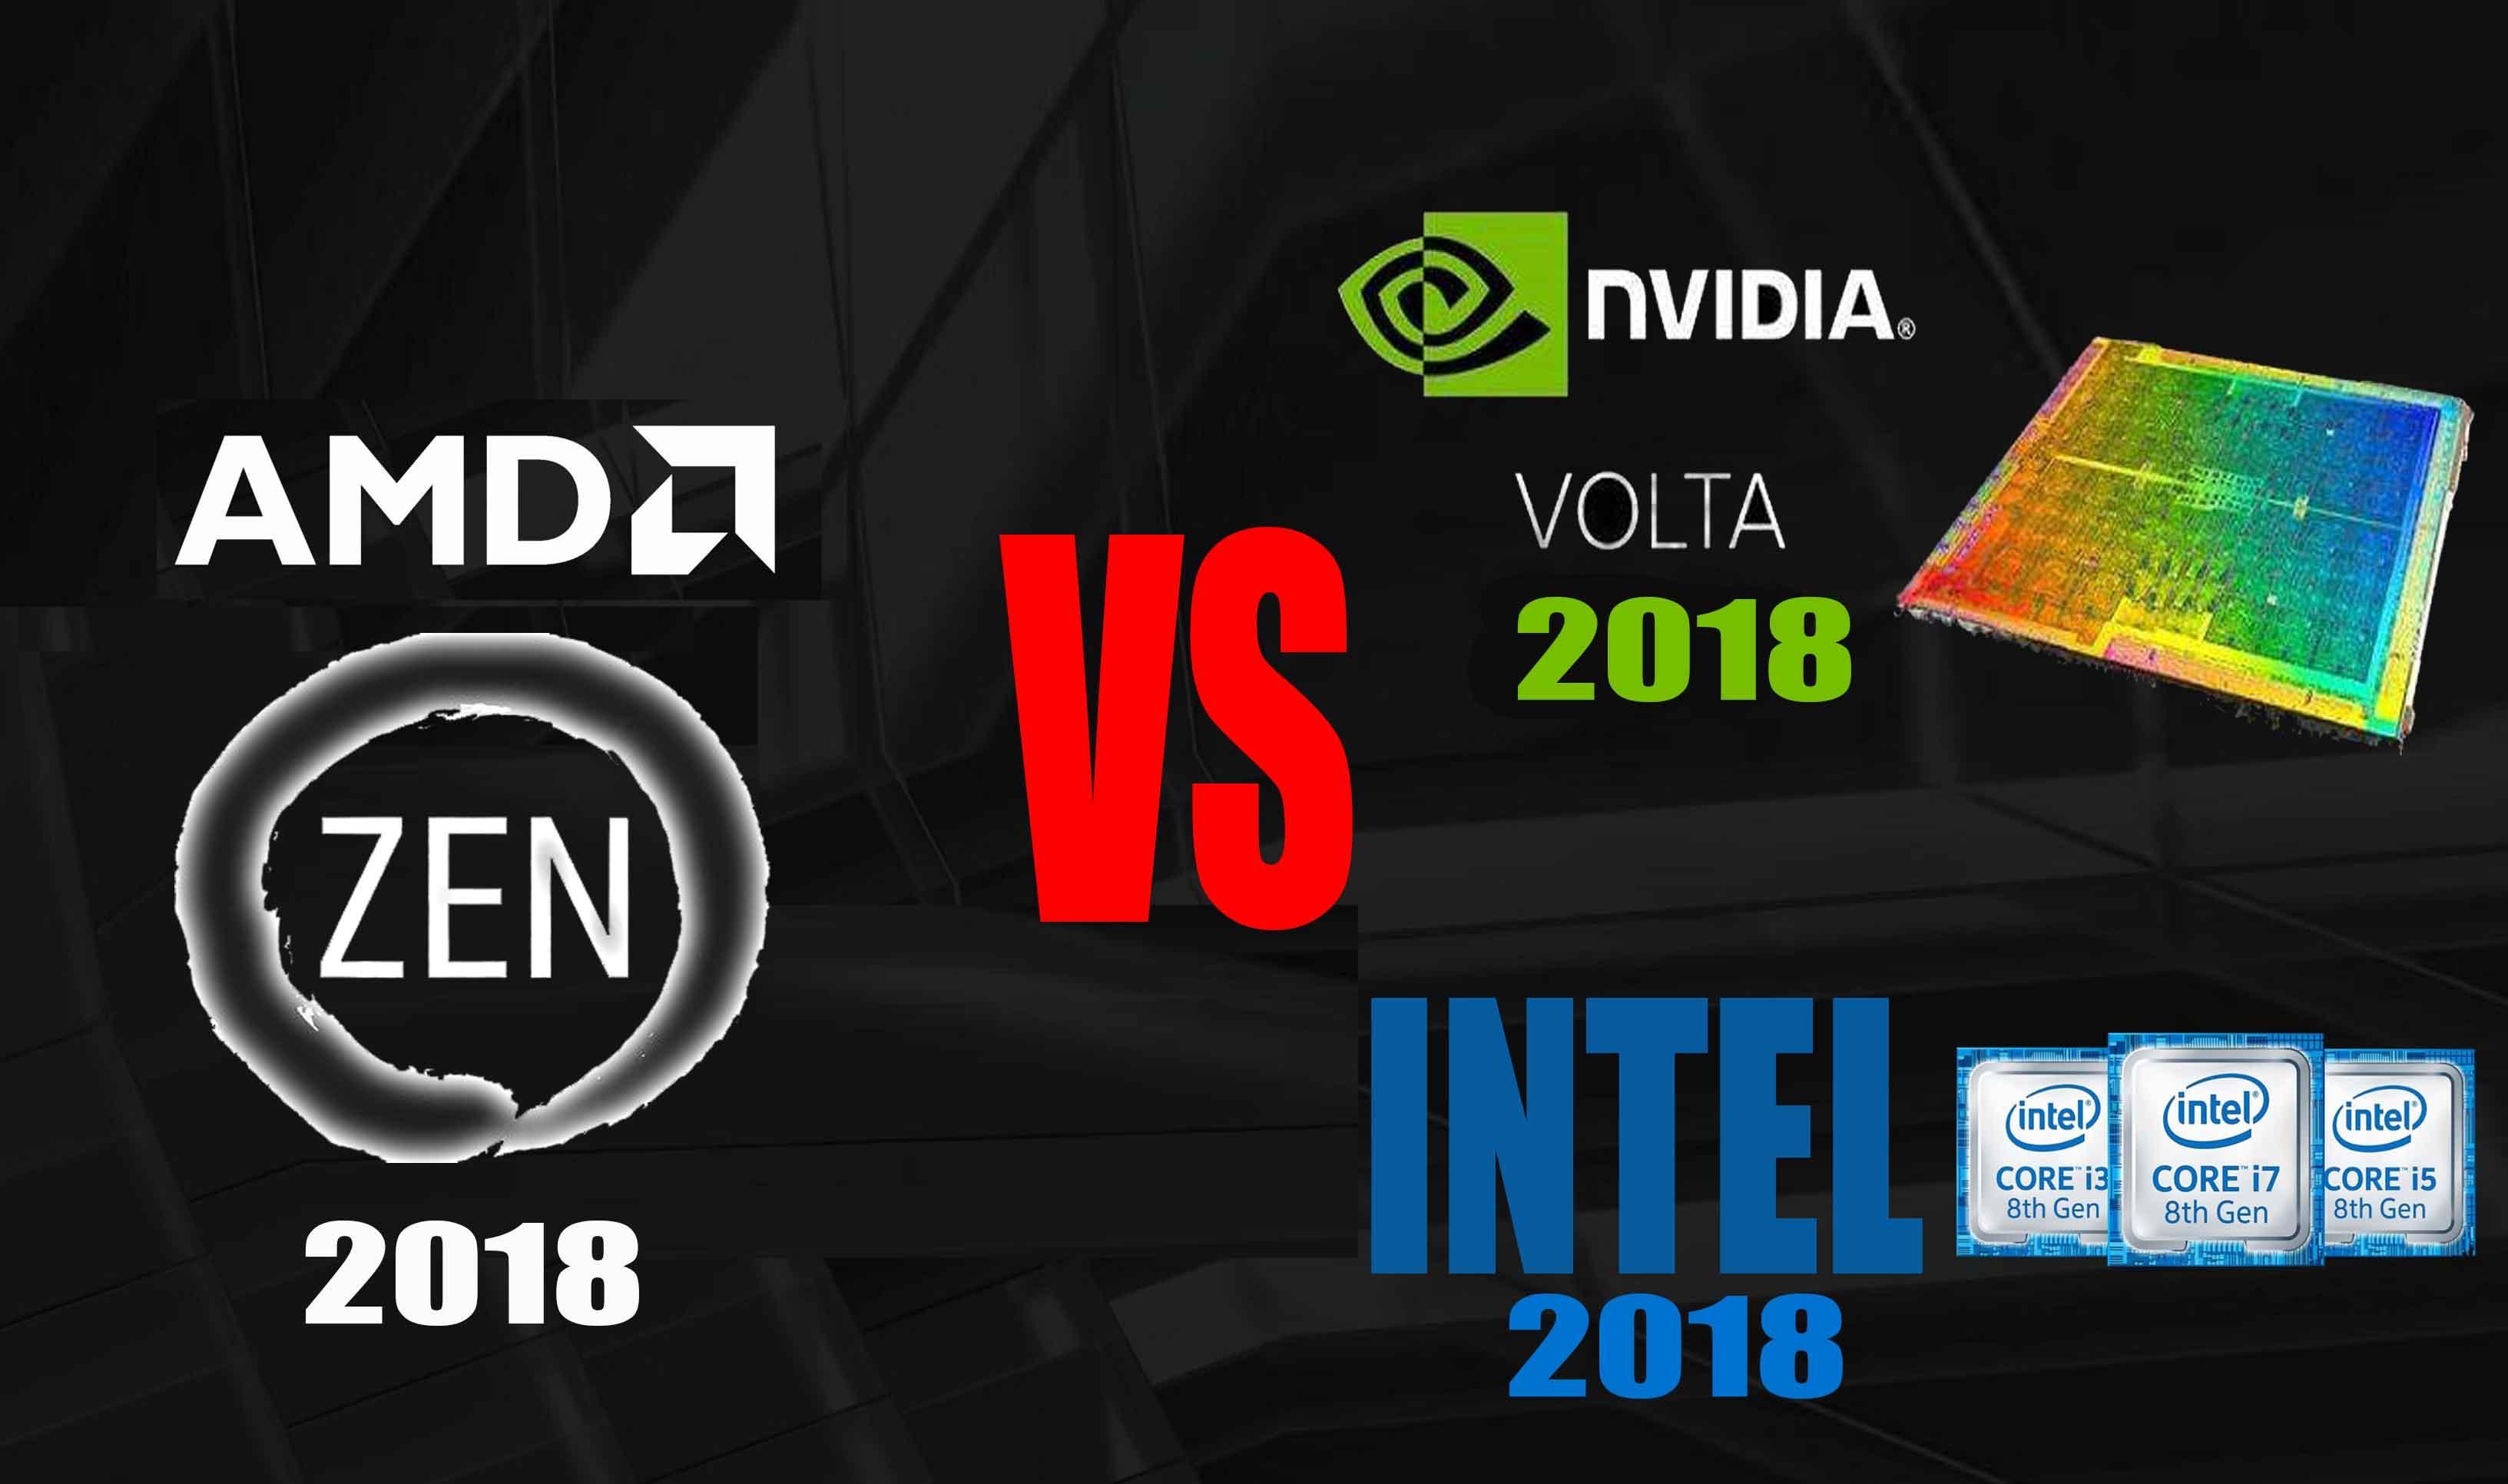 AMD Is A Better Recession Choice Than Peers - Advanced Micro Devices, Inc. (NASDAQ:AMD) | Seeking Alpha